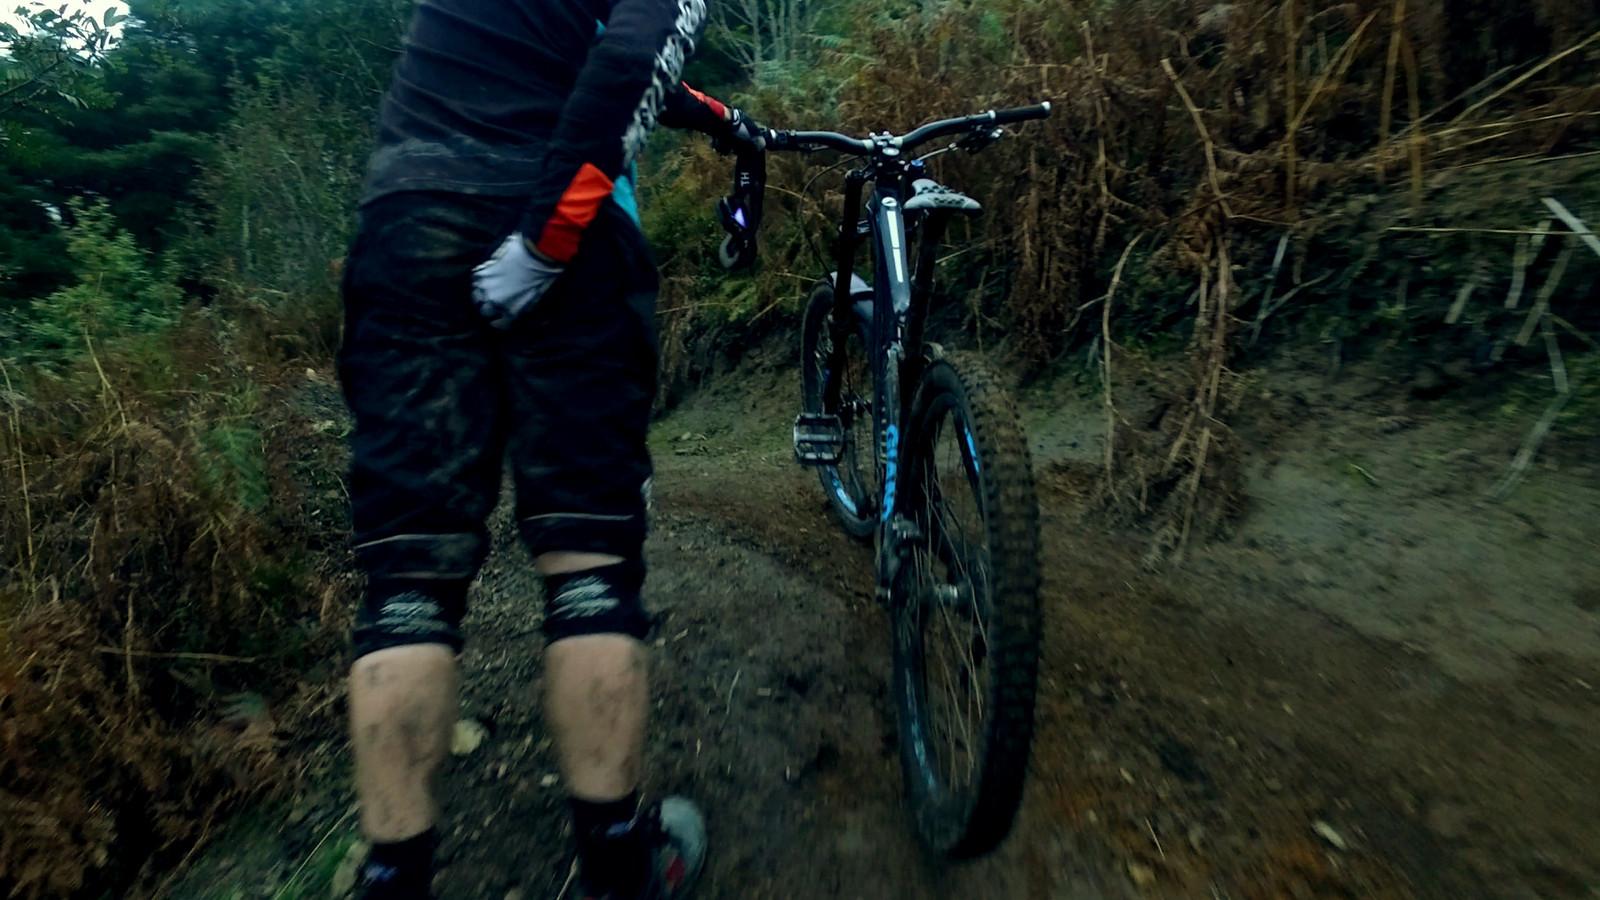 MILKY - Matthew Davies - Mountain Biking Pictures - Vital MTB